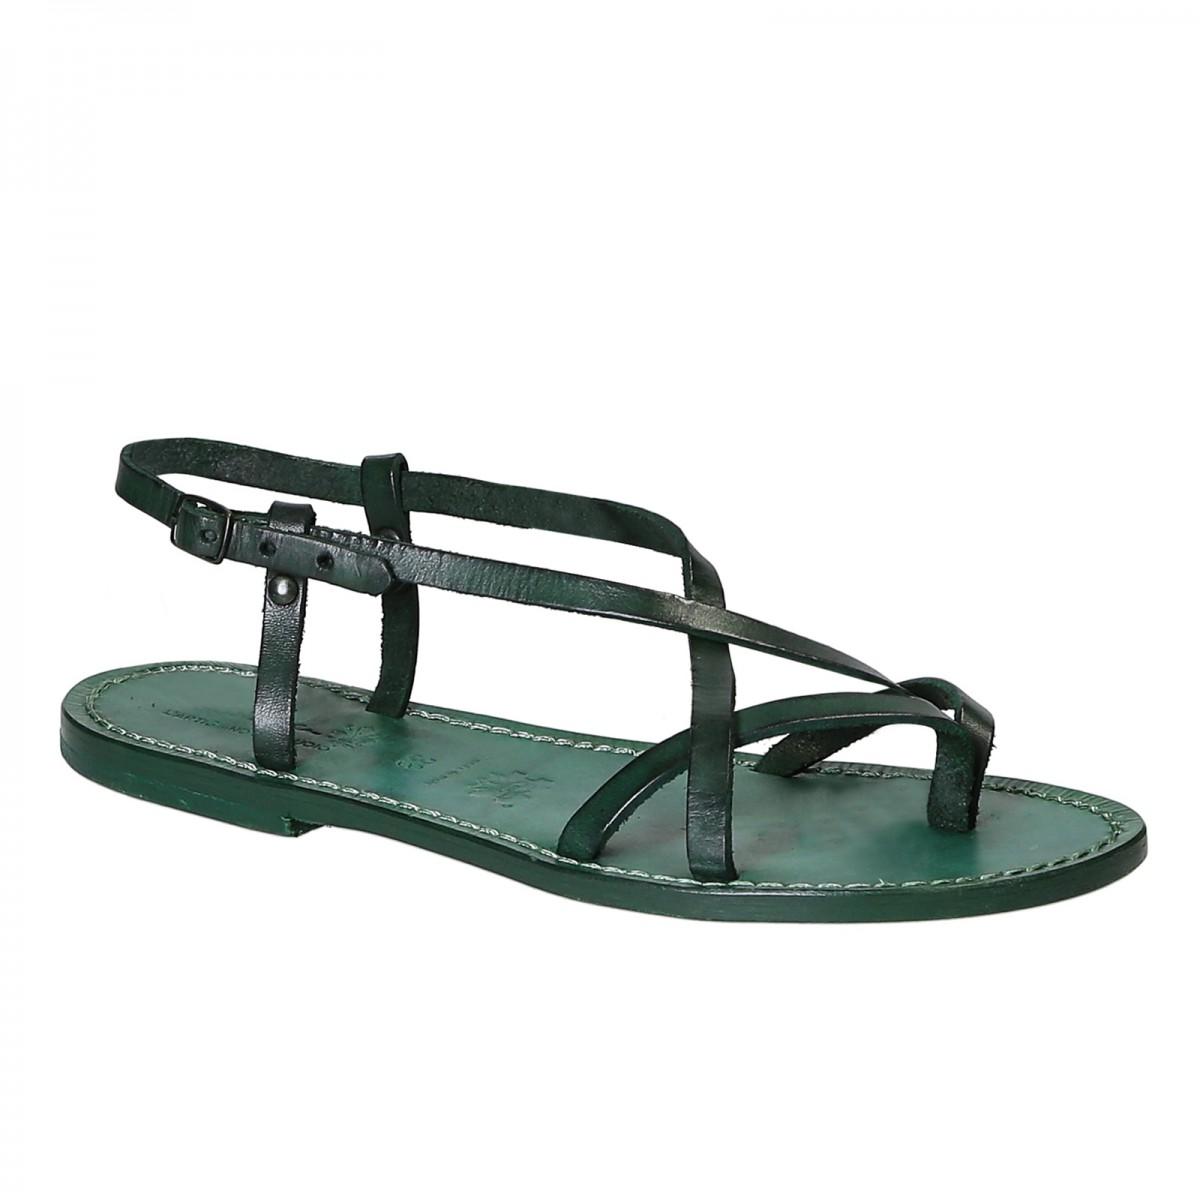 Chaussures - Sandales Gianluca L'artisan Du Cuir FD1mD5o7h